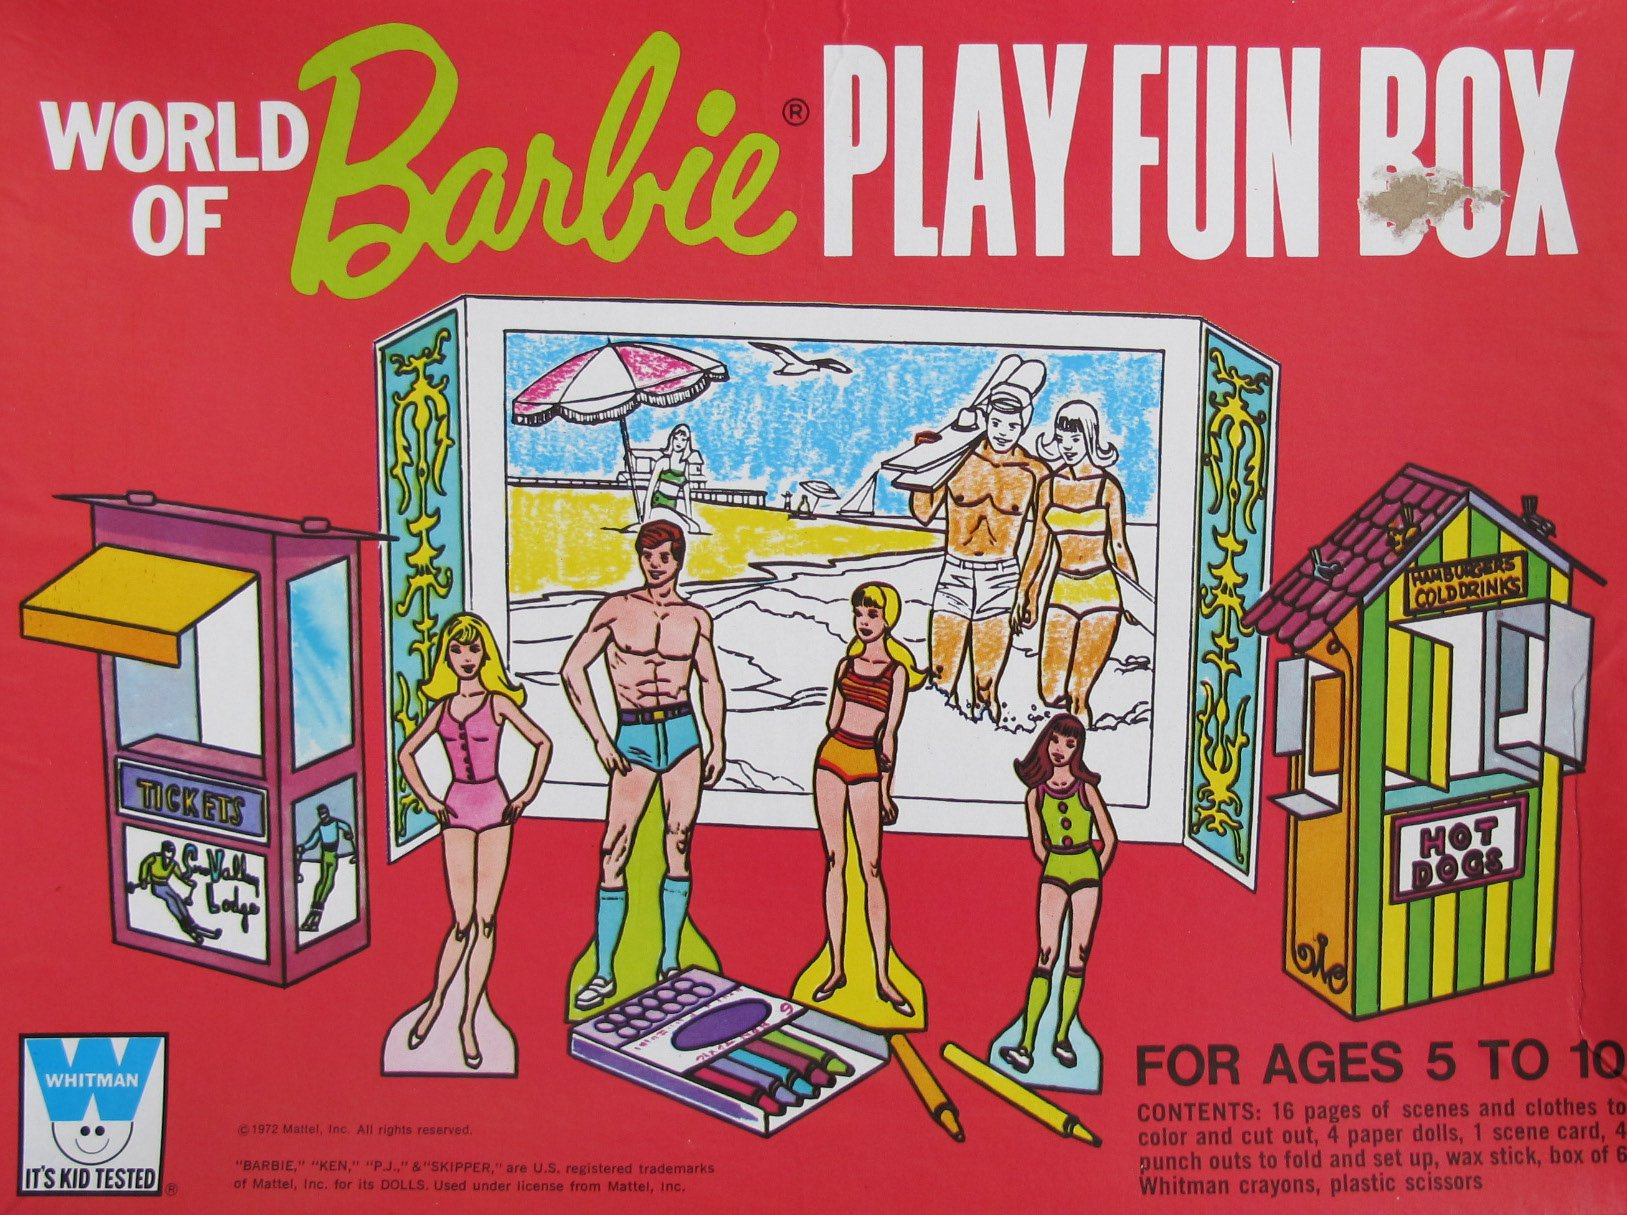 World of Barbie Play Fun Box w 4 Paper DOLLS (Barbie, Ken, P.J., Skipper), SCENE CARD (Diorama), Clothes/Scenes to Color & MORE! (1972 Whitman, Mattel)